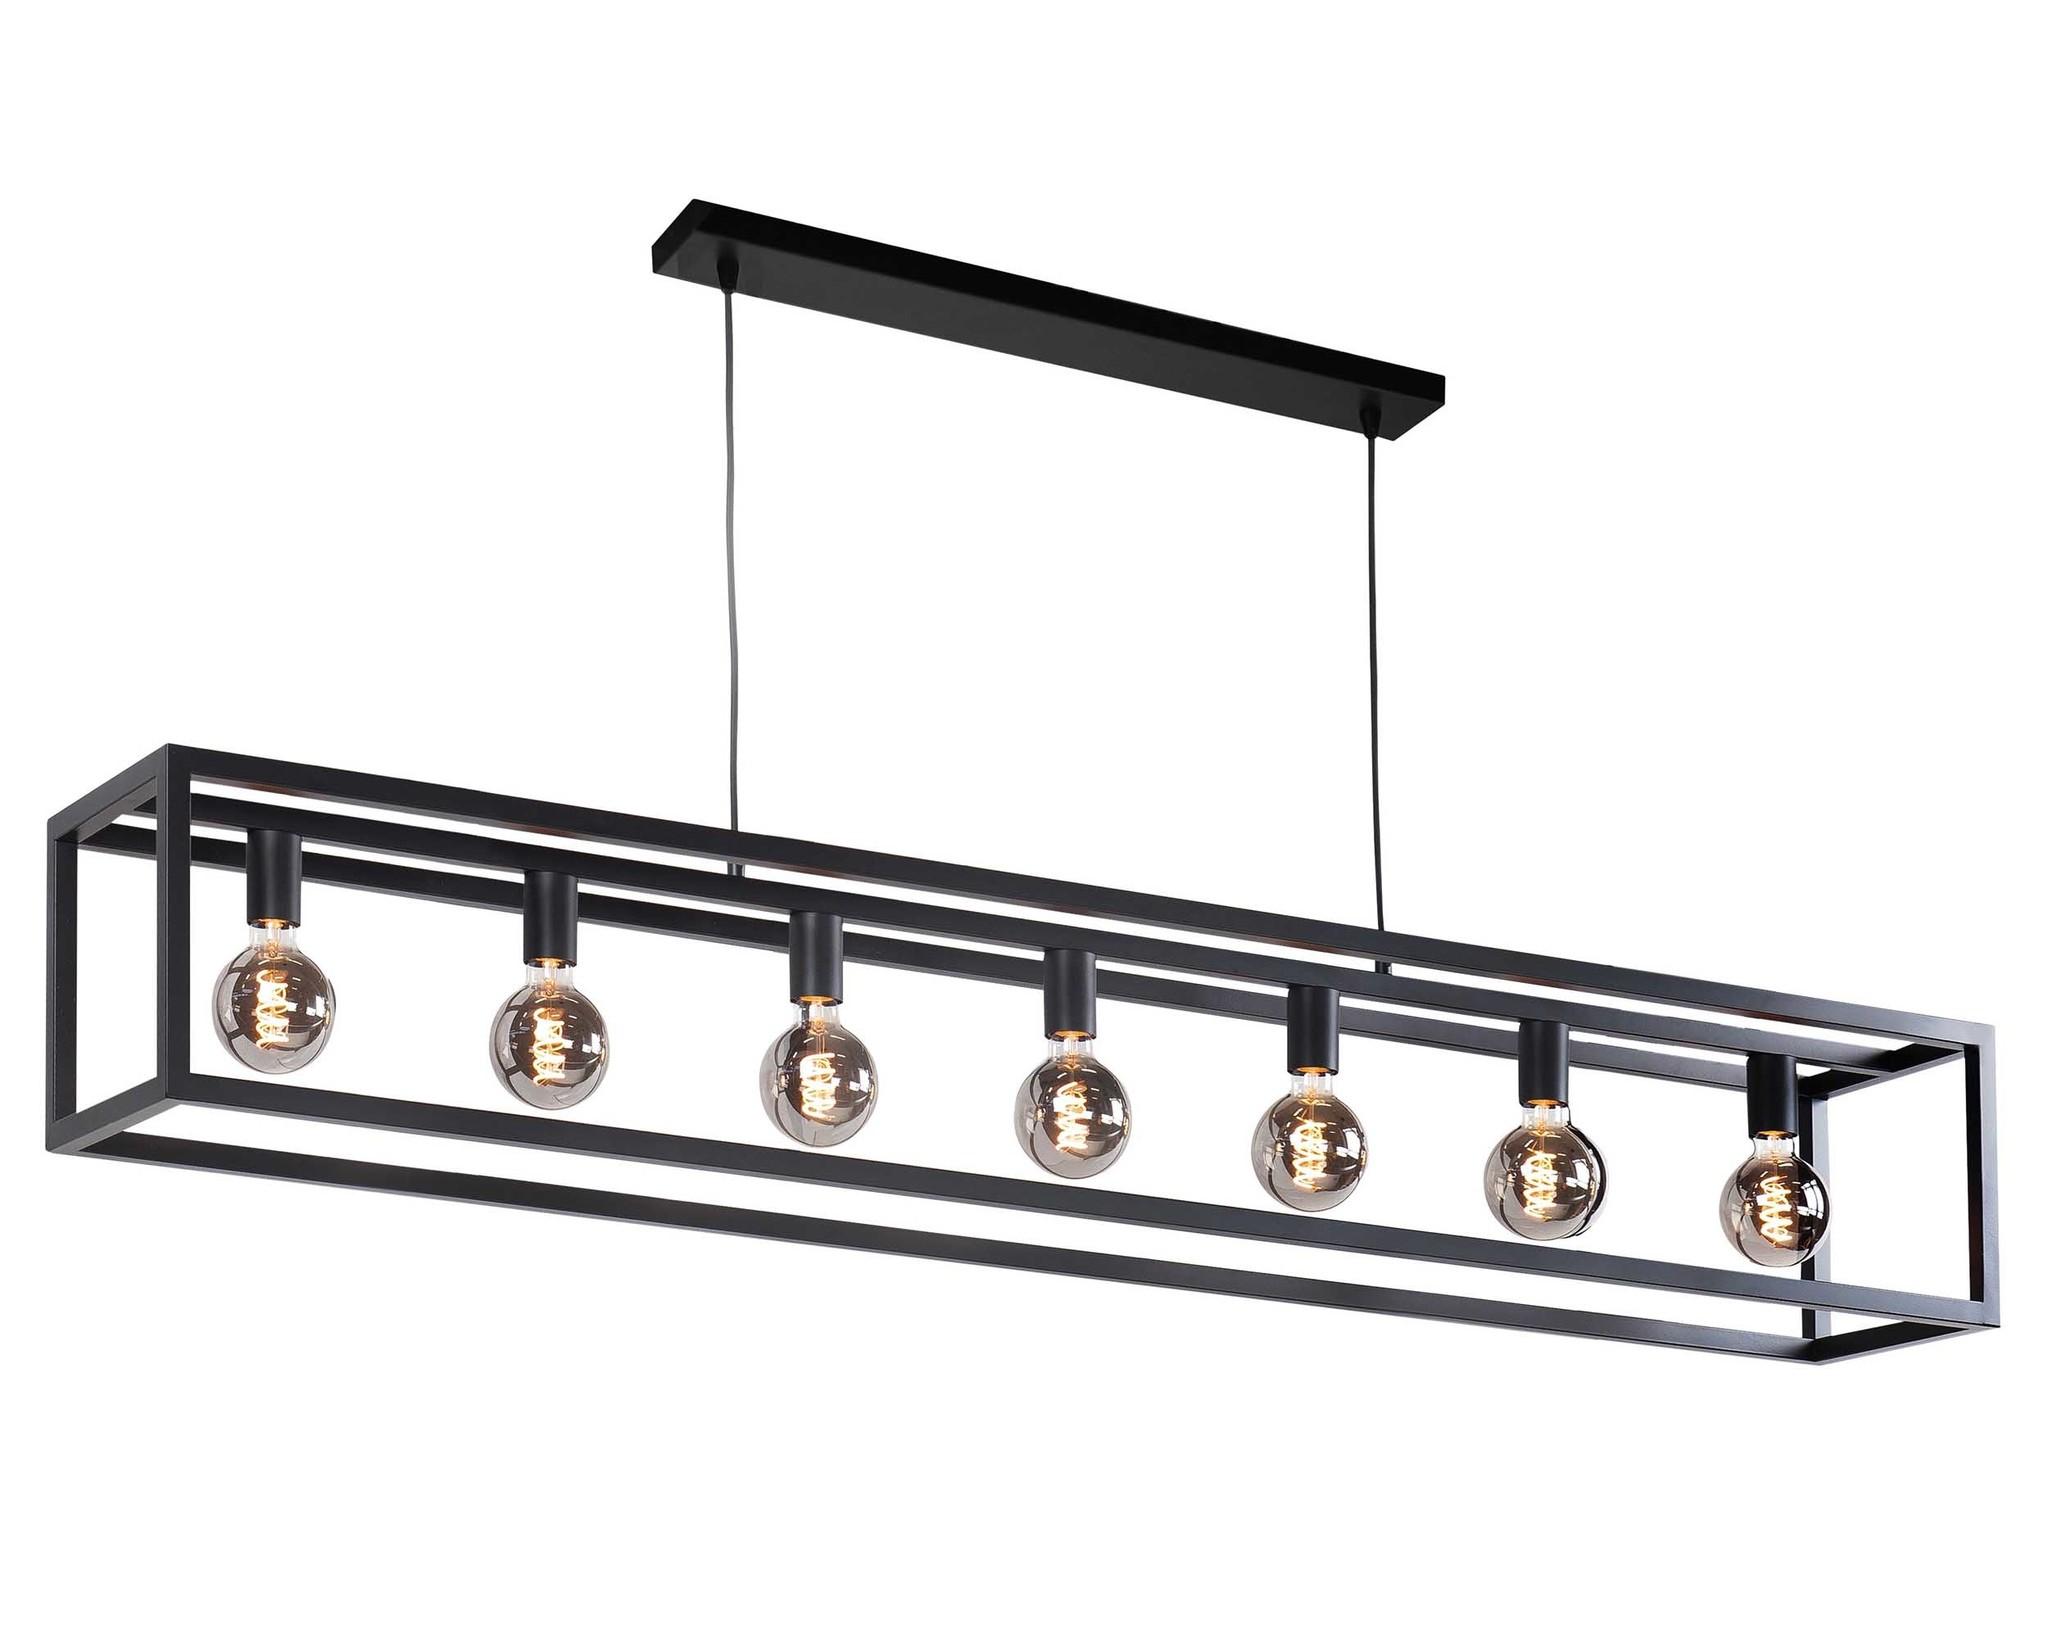 Highlight Hanglamp Fragola 7 lichts L 170 cm B 25 cm zwart